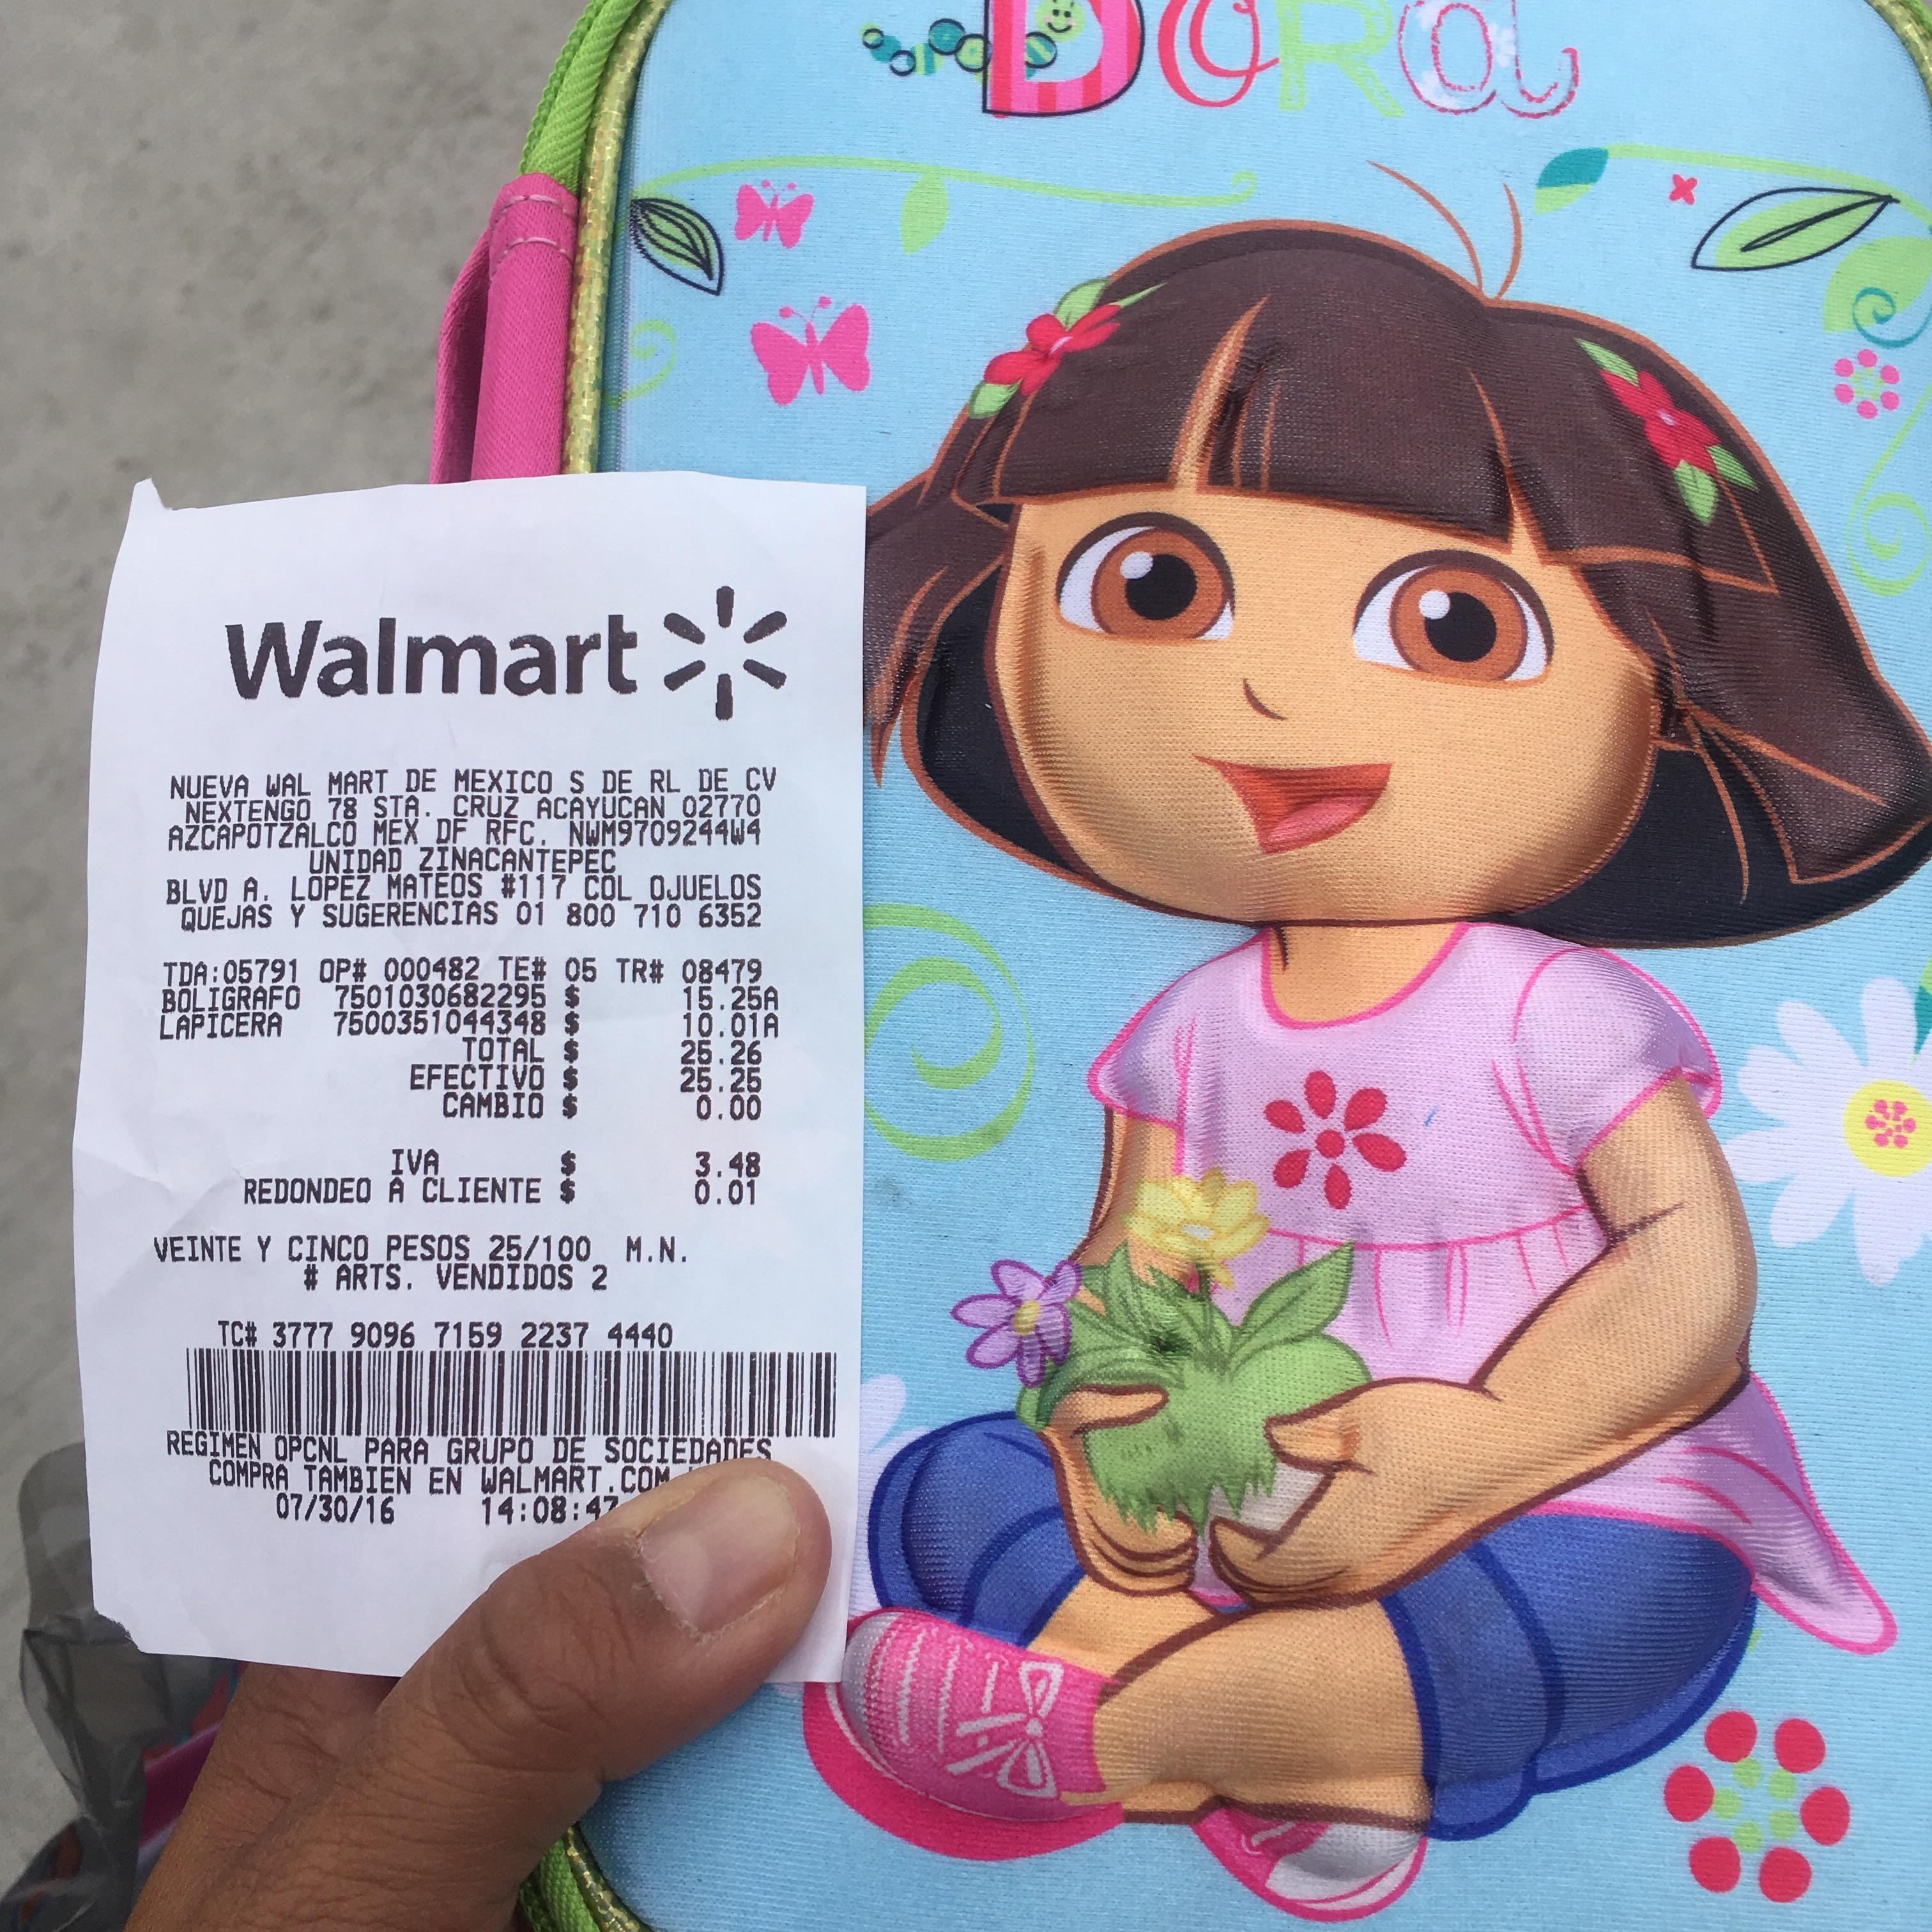 Walmart Liquidacion: Lapicera Dora